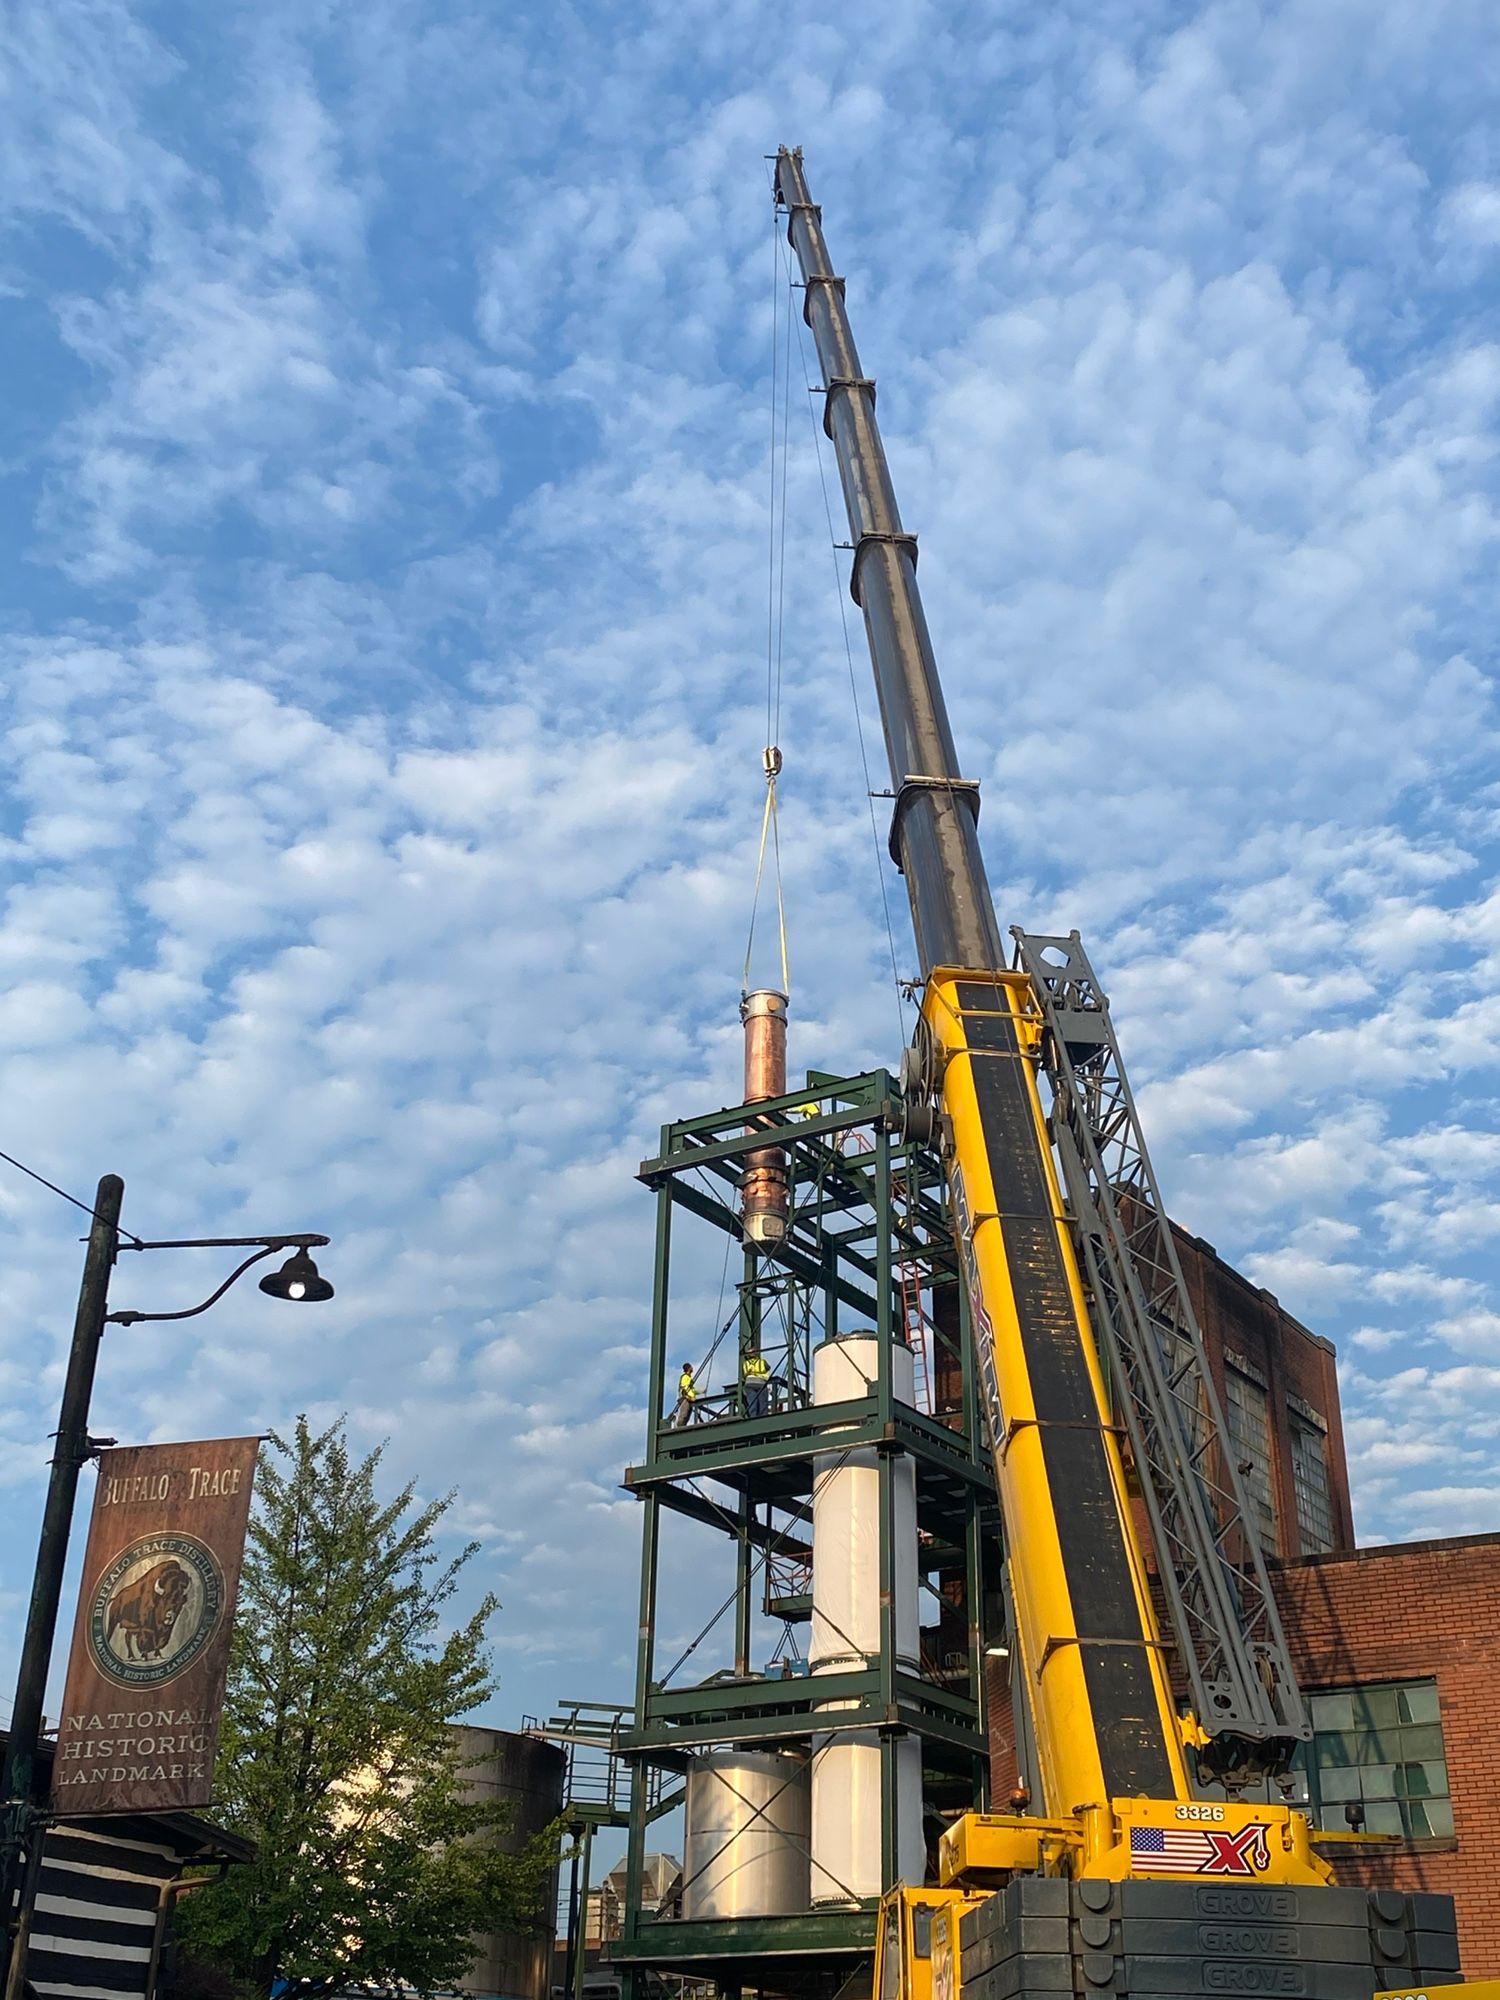 Buffalo Trace Distillery Makes Headway on $1.2 Billion Expansion